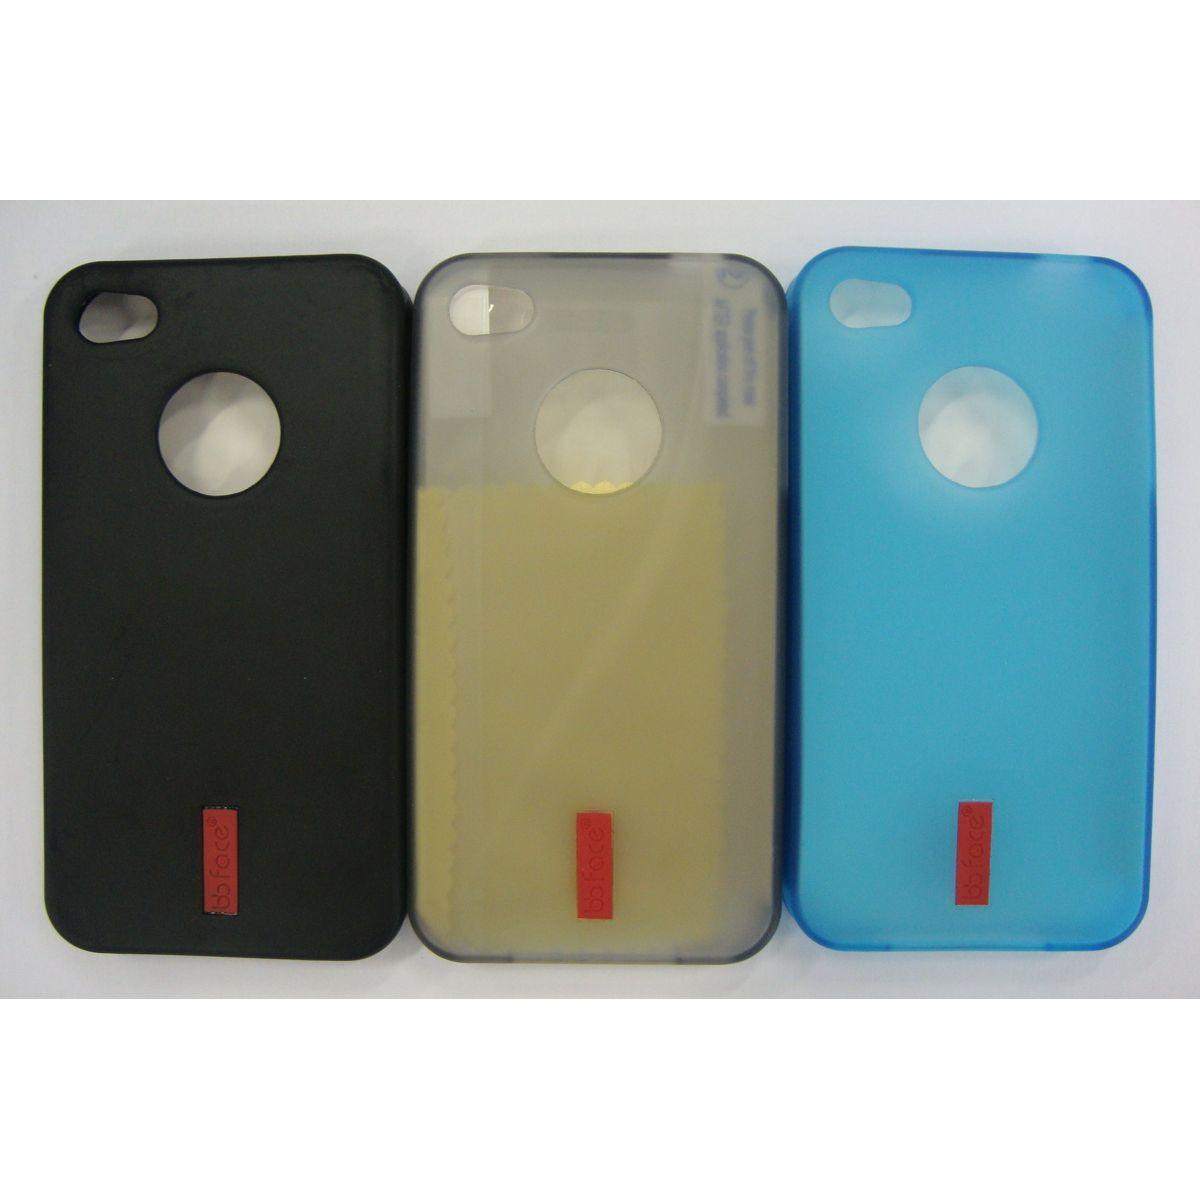 3 Capas iPhone 4 / 4s + Película Protetora